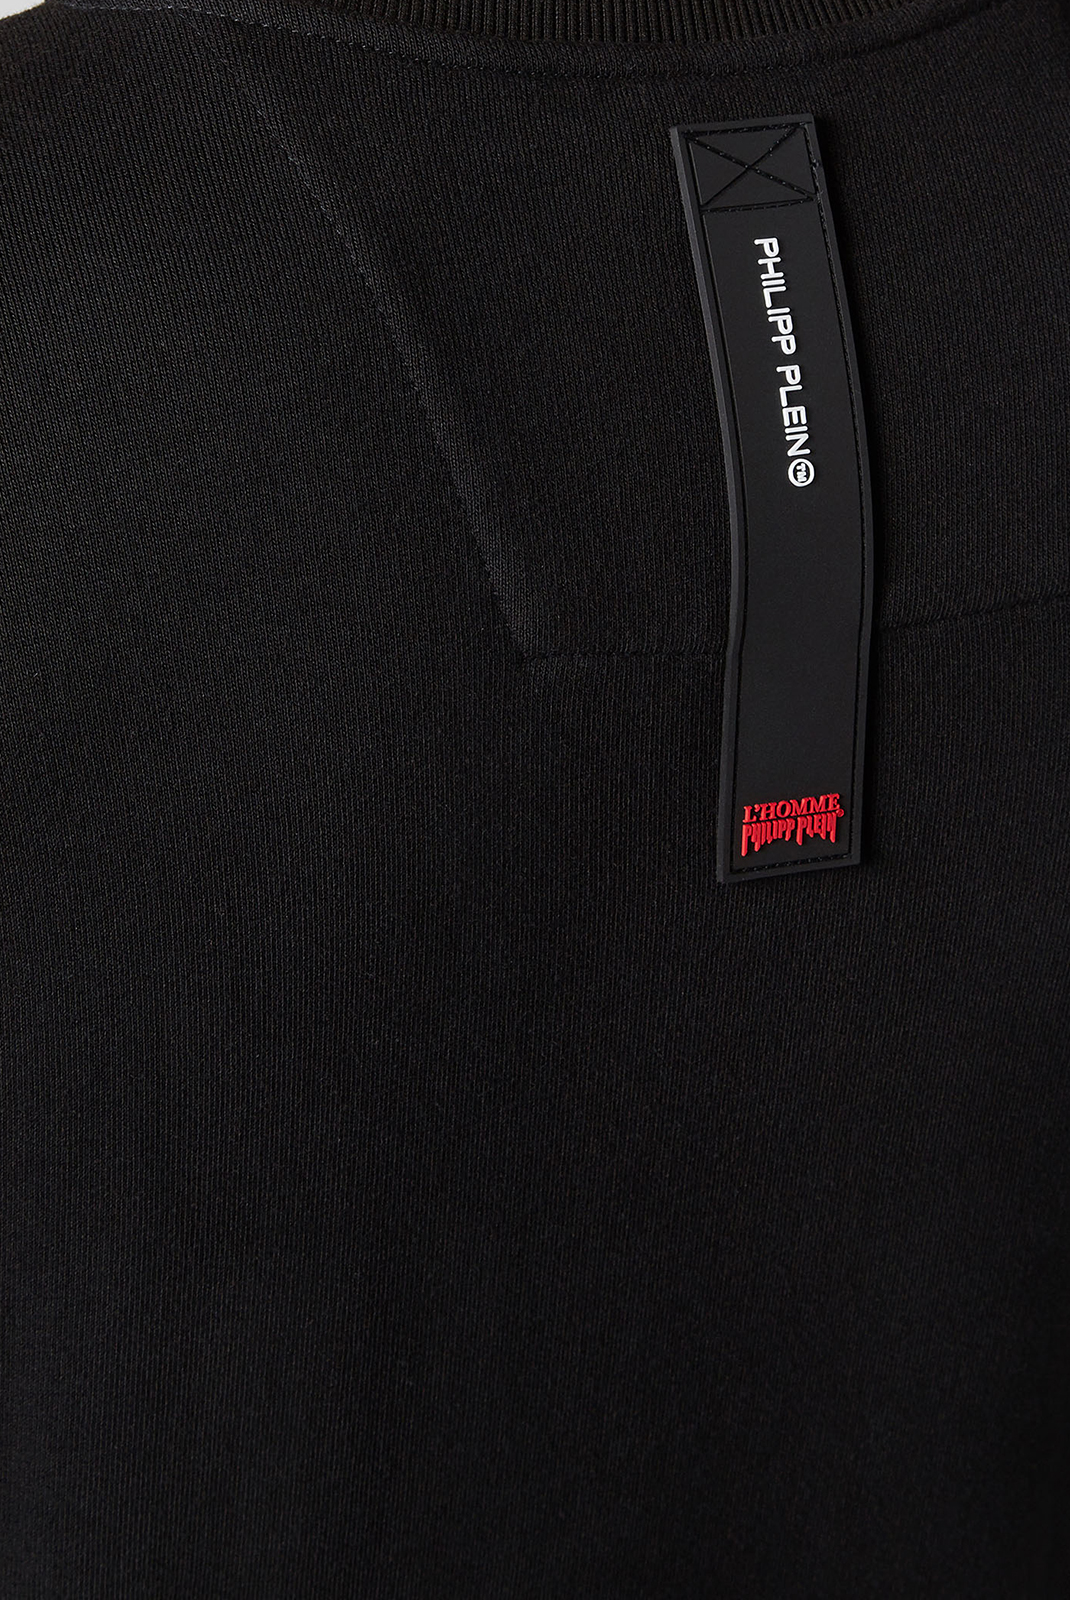 Sweatshirts  Philipp plein MJO0518 LS SKULL 02 BLACK